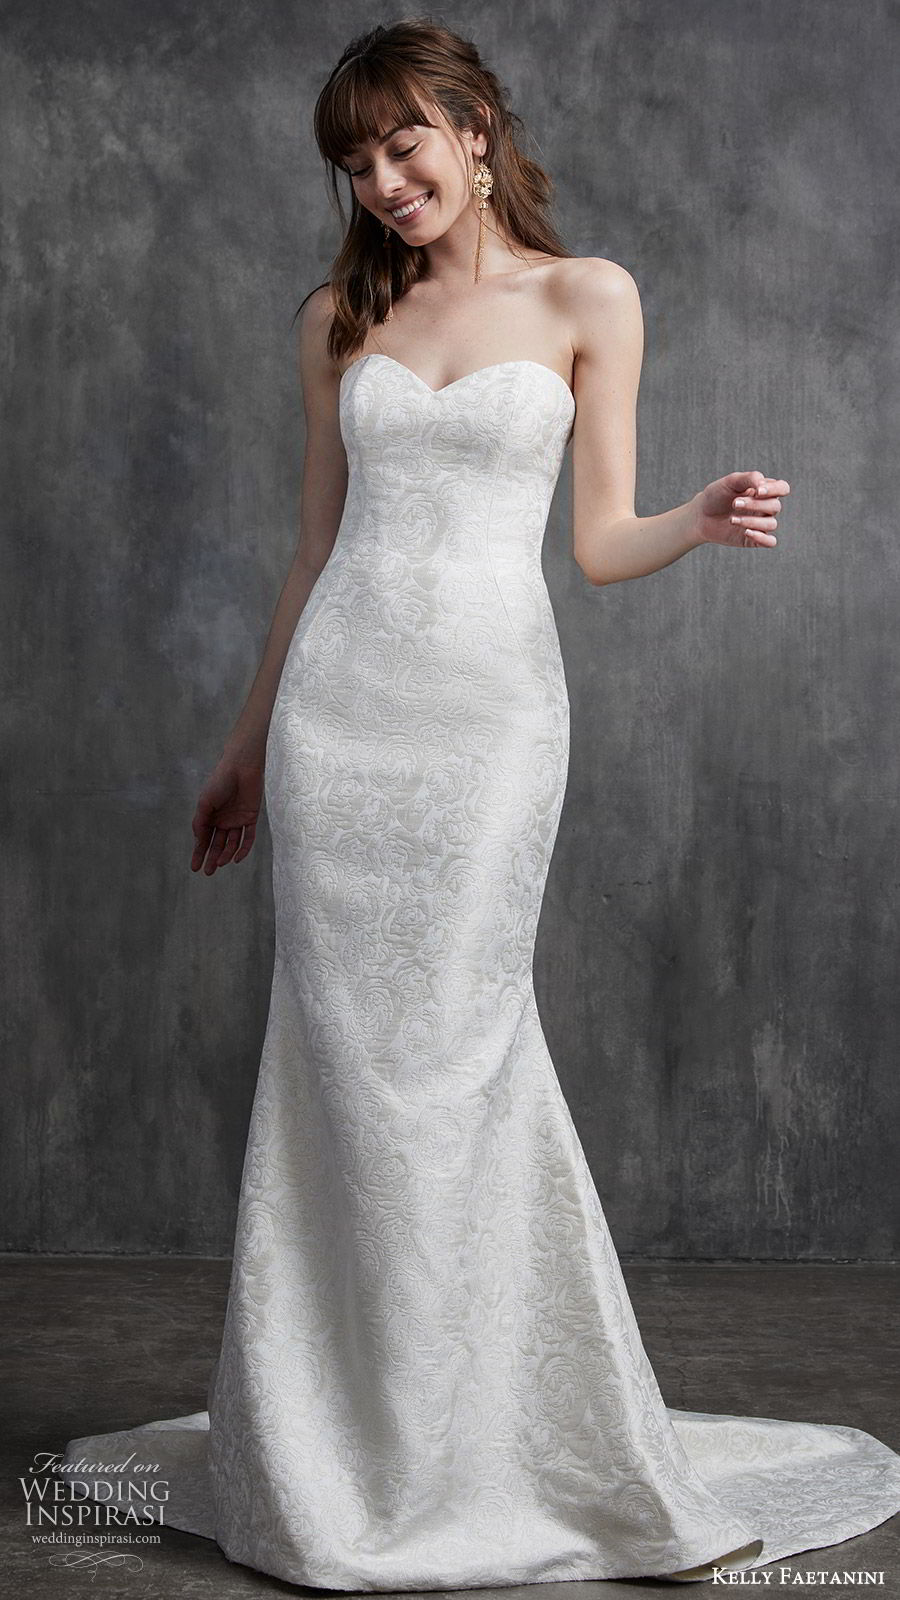 kelly faetanini spring 2020 bridal strapless sweetheart sheath mermaid embellished wedding dress (9) chapel train elegant classic mv